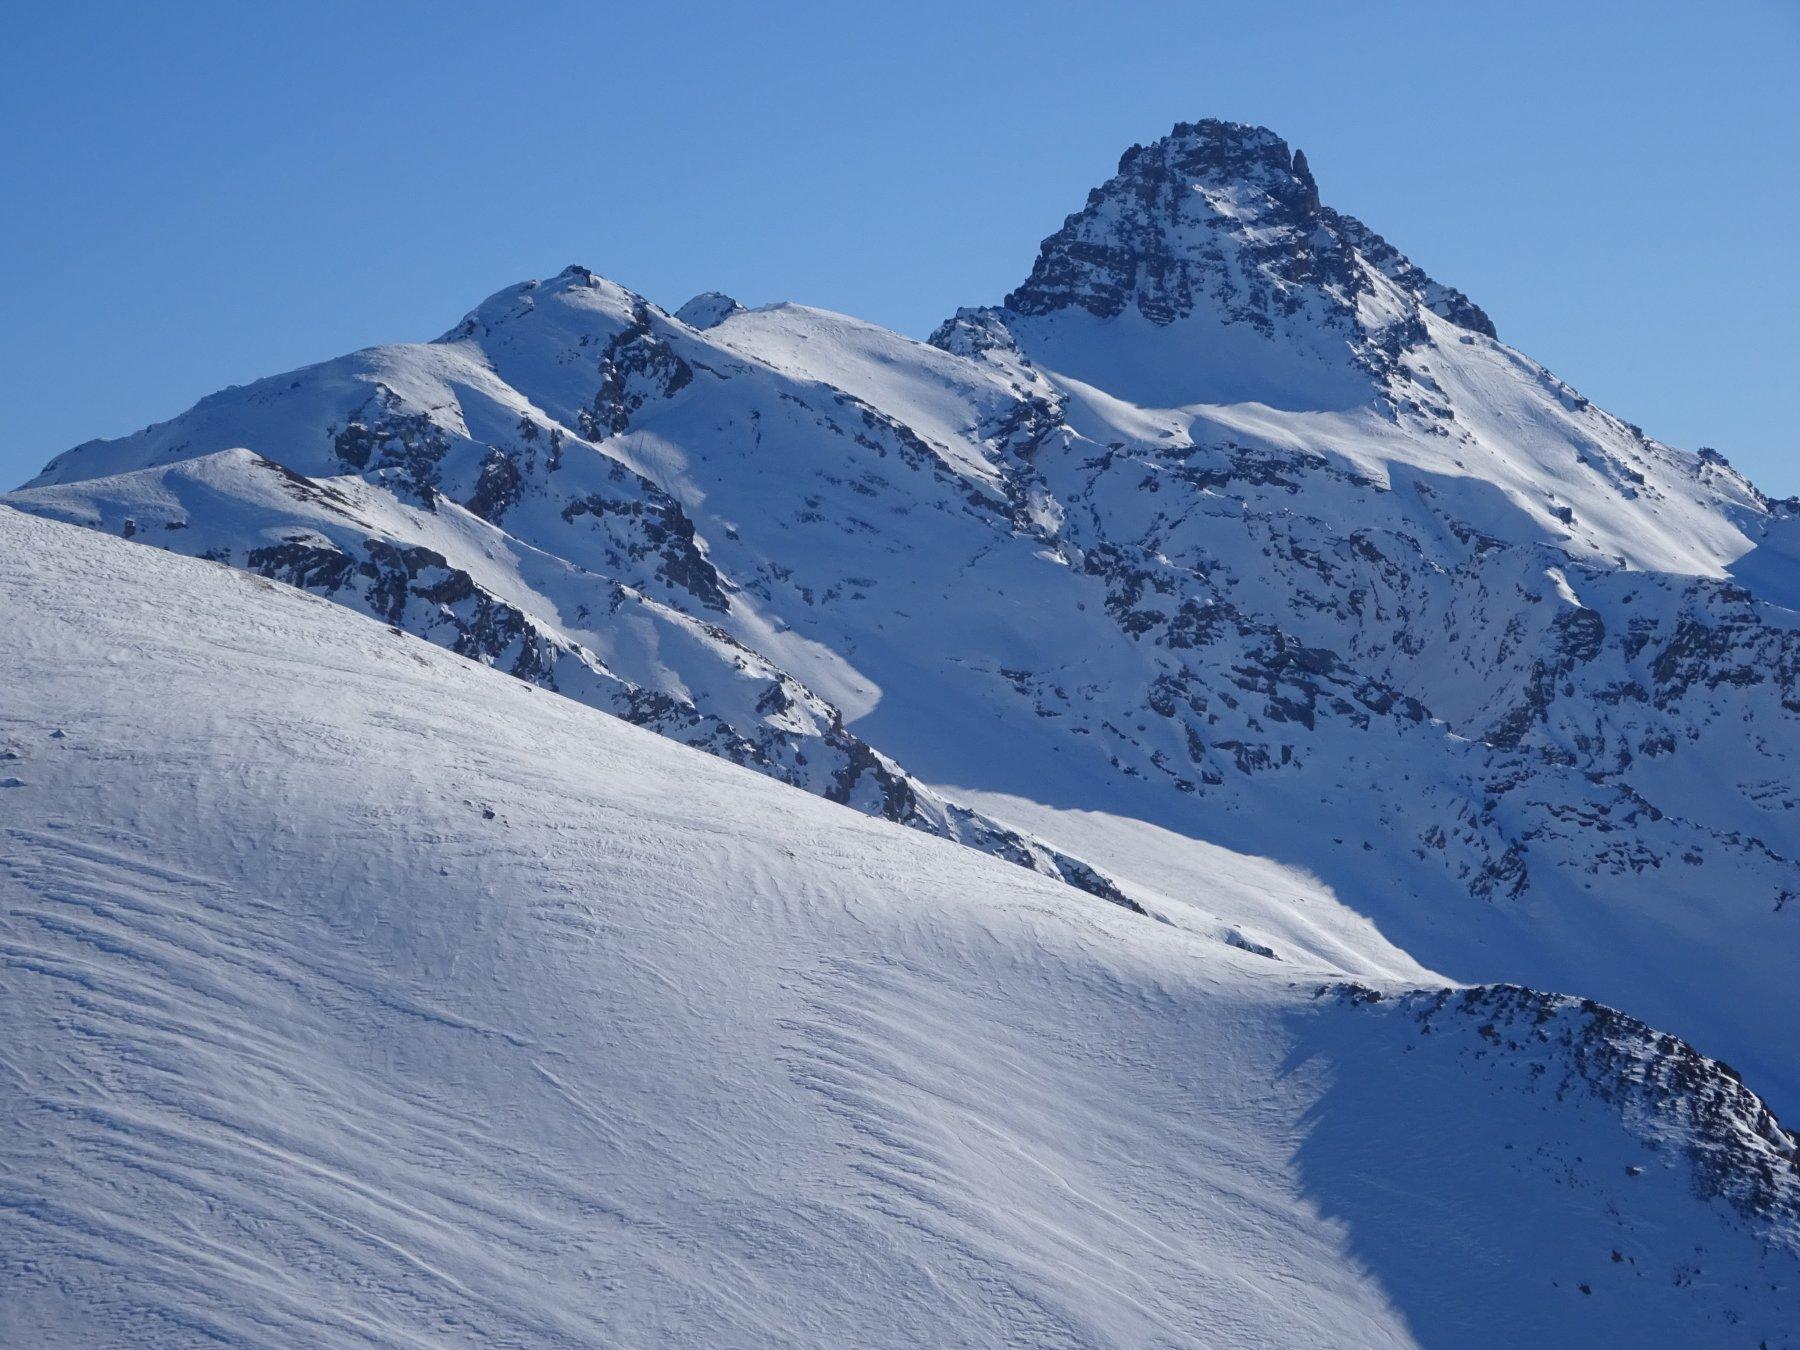 Pic de Rochebrune dal Lasseron